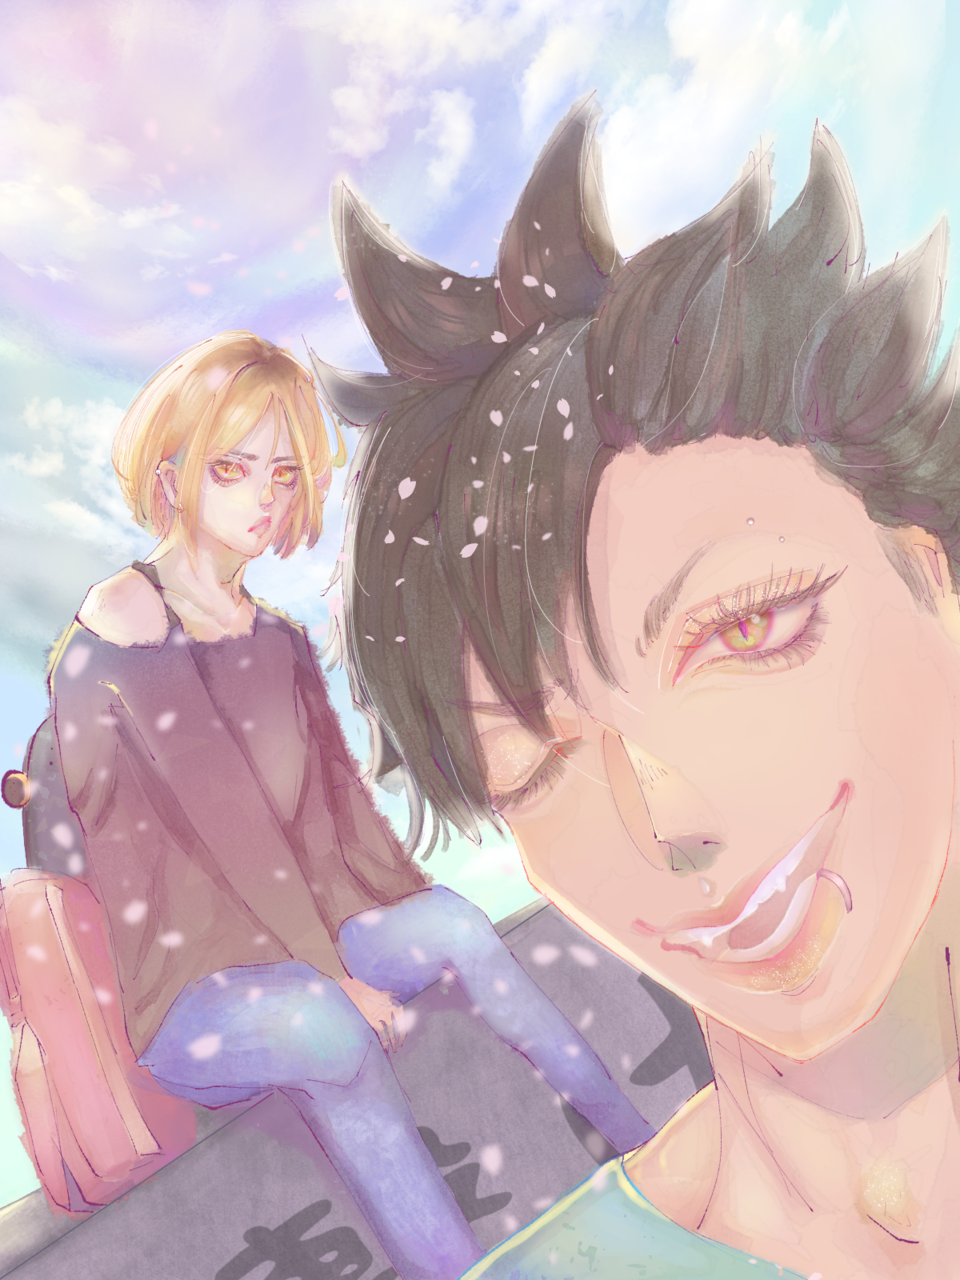 KUROKEN Illust of macchizume illustration KenmaKozume Haikyu!! animeboy pastel digital drawing kuroo Kenma commission